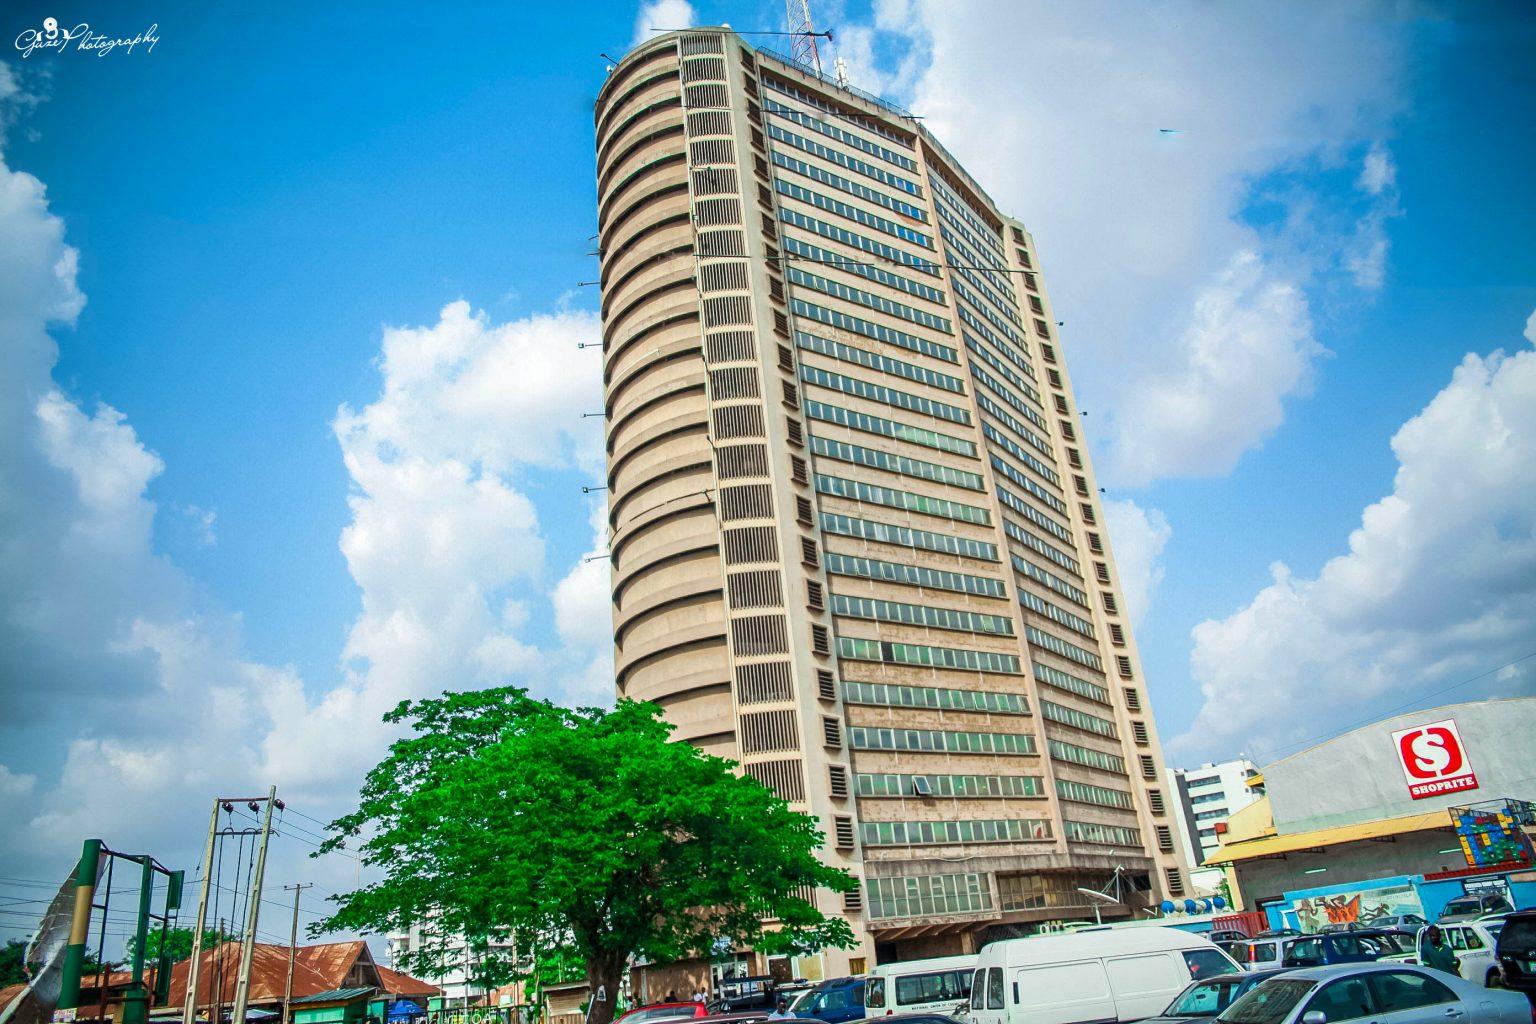 Oyo State, Nigeria